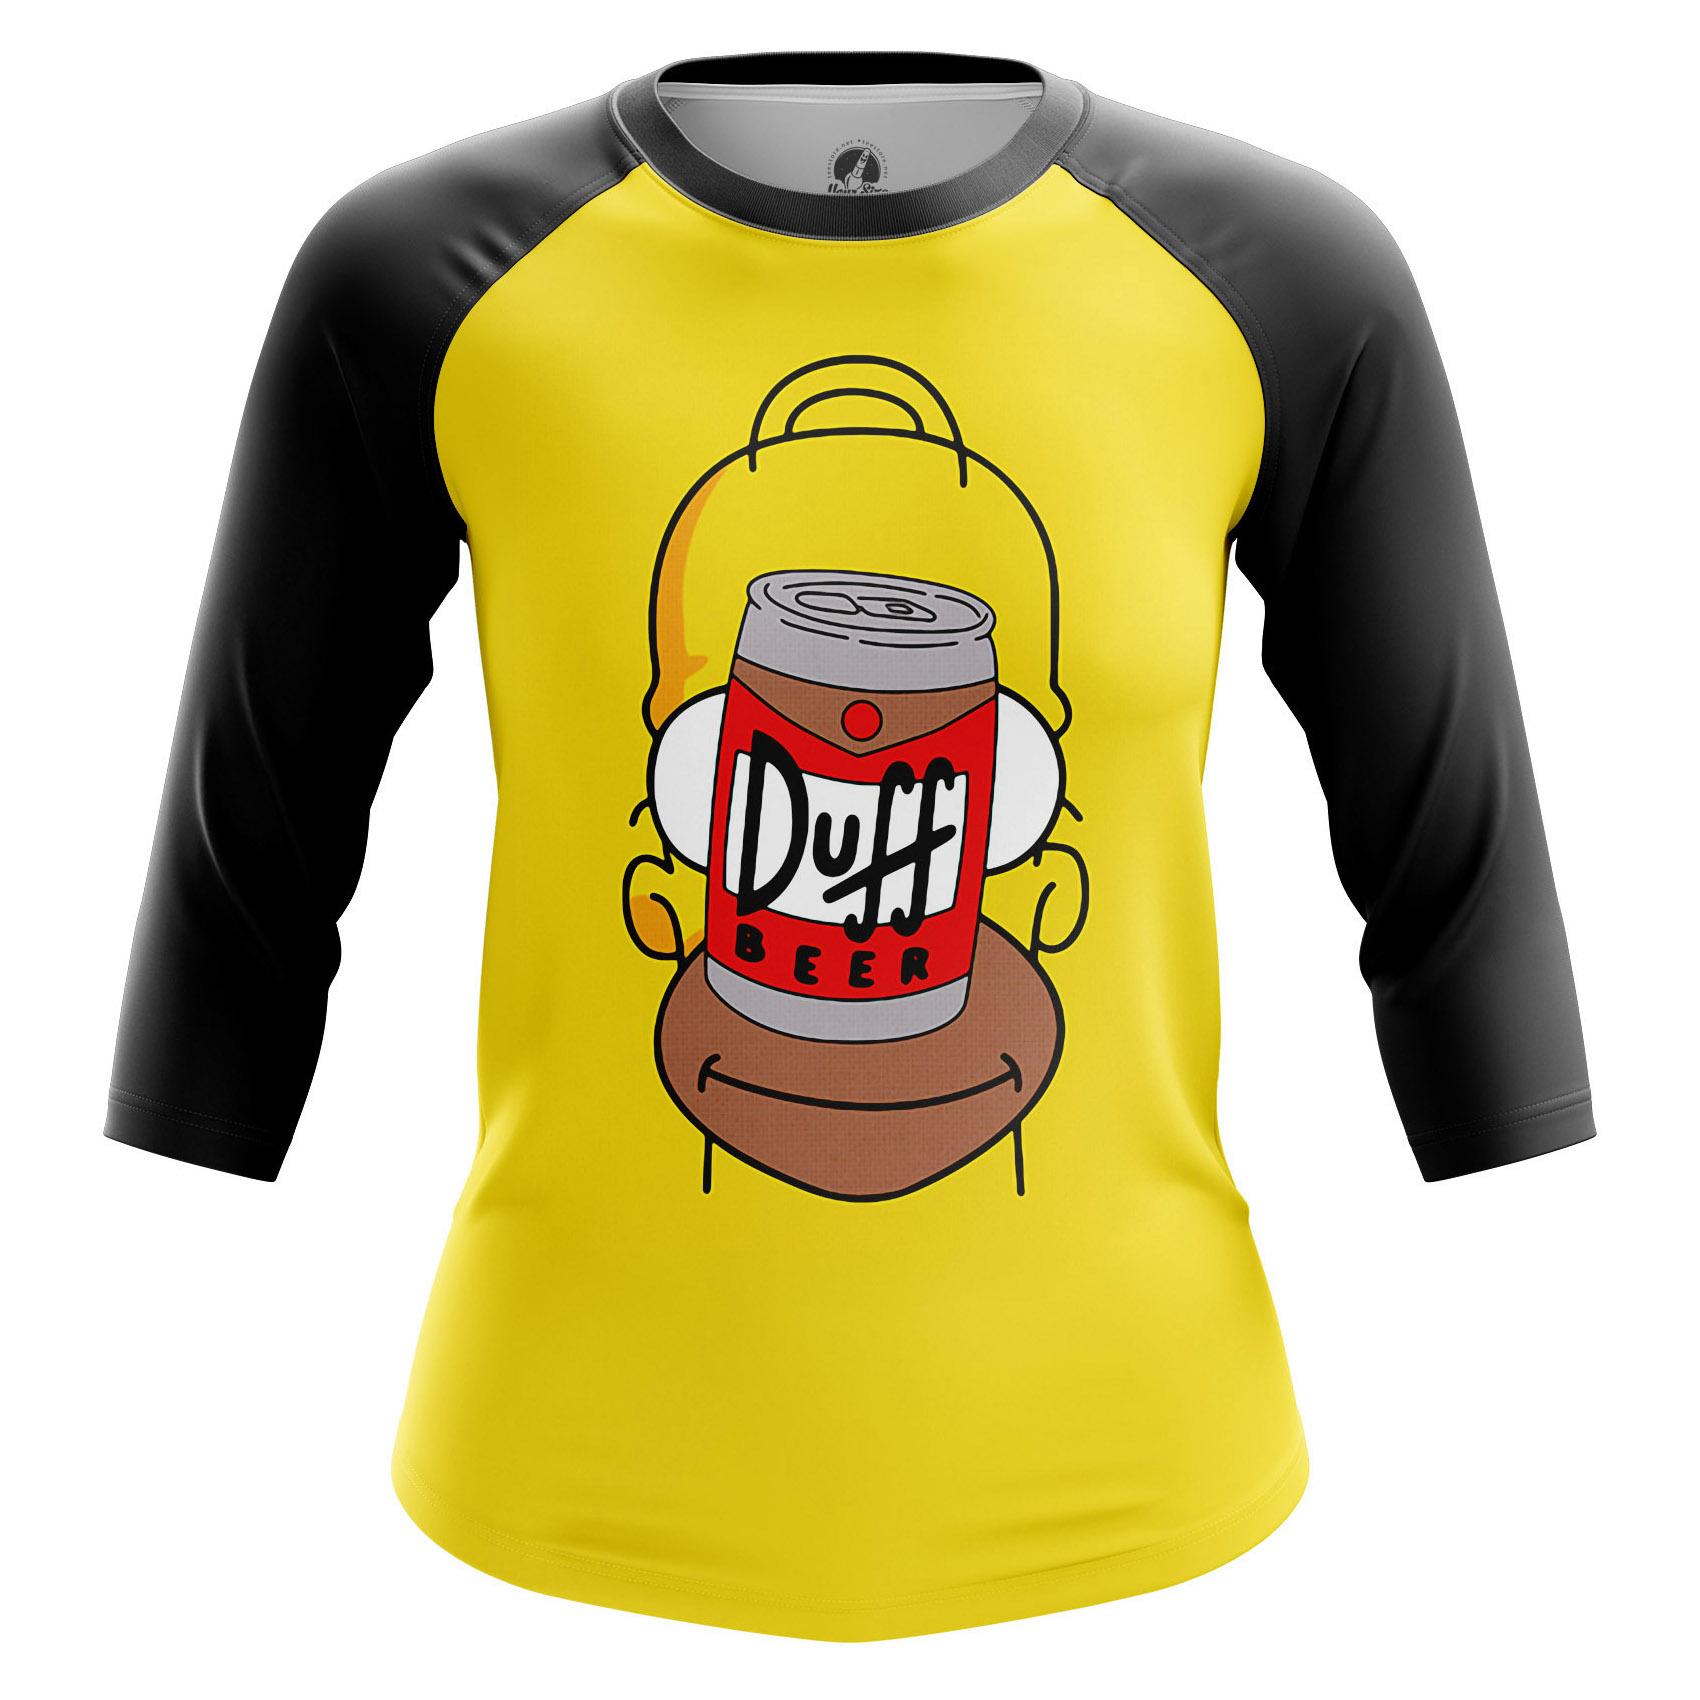 Collectibles Women'S Raglan Duff Face Simpsons